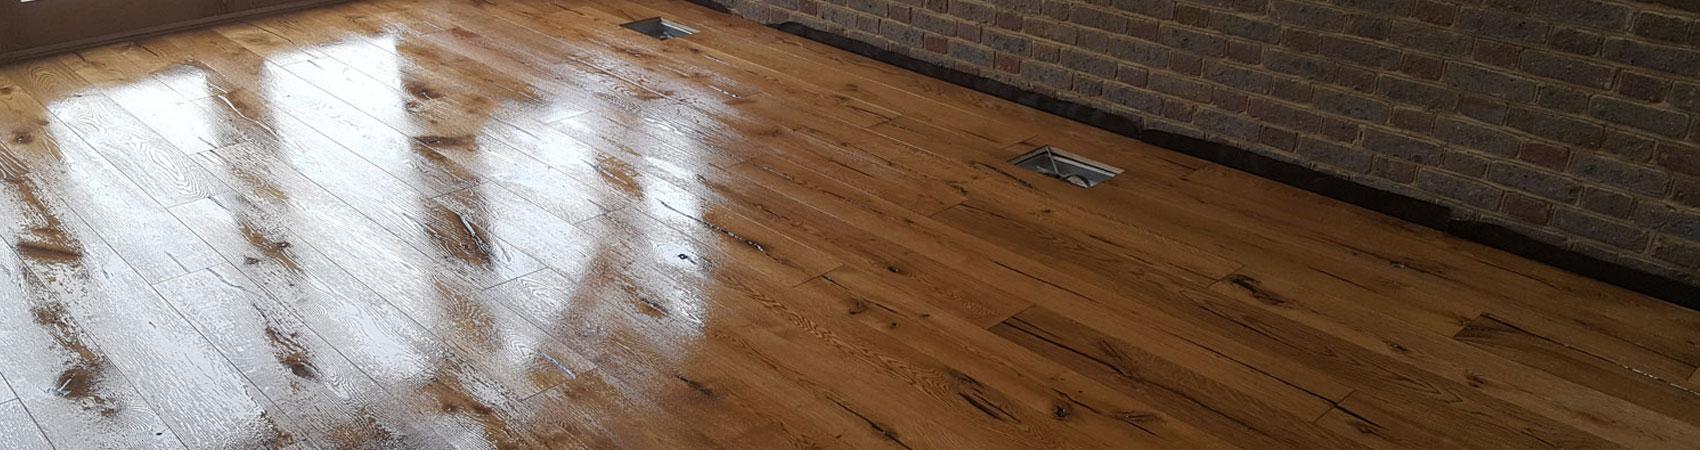 Engineered Board Rustic Grade Oak Osmo After Wet